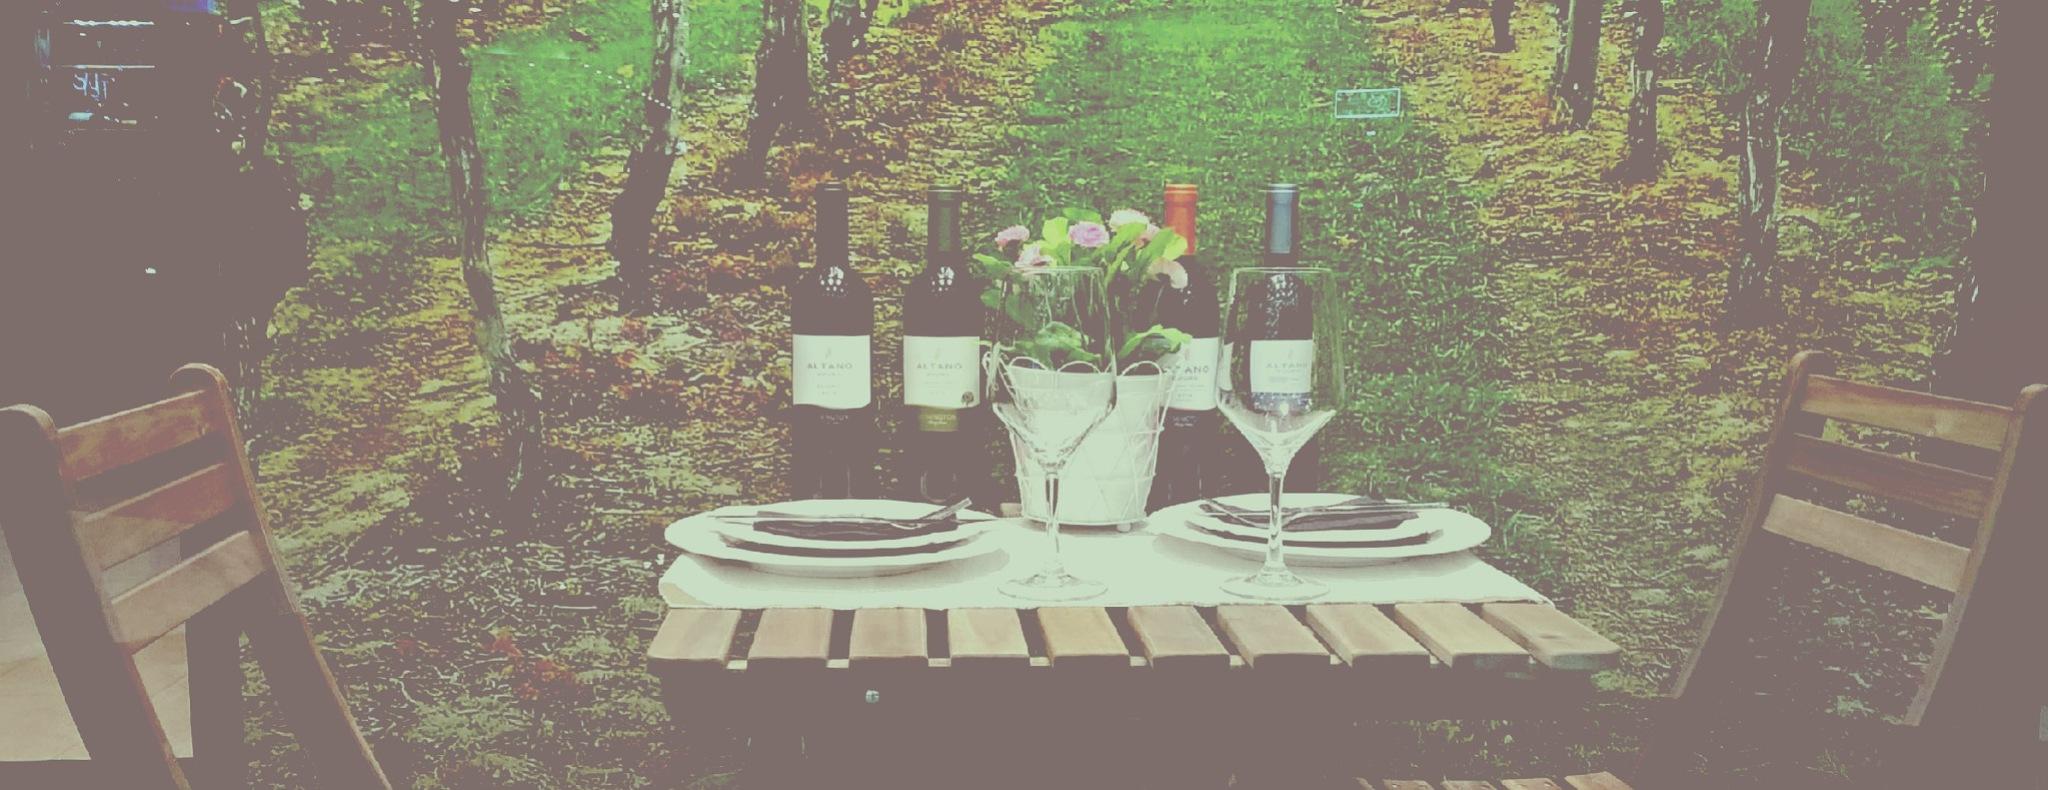 First date by Krasi Asenov